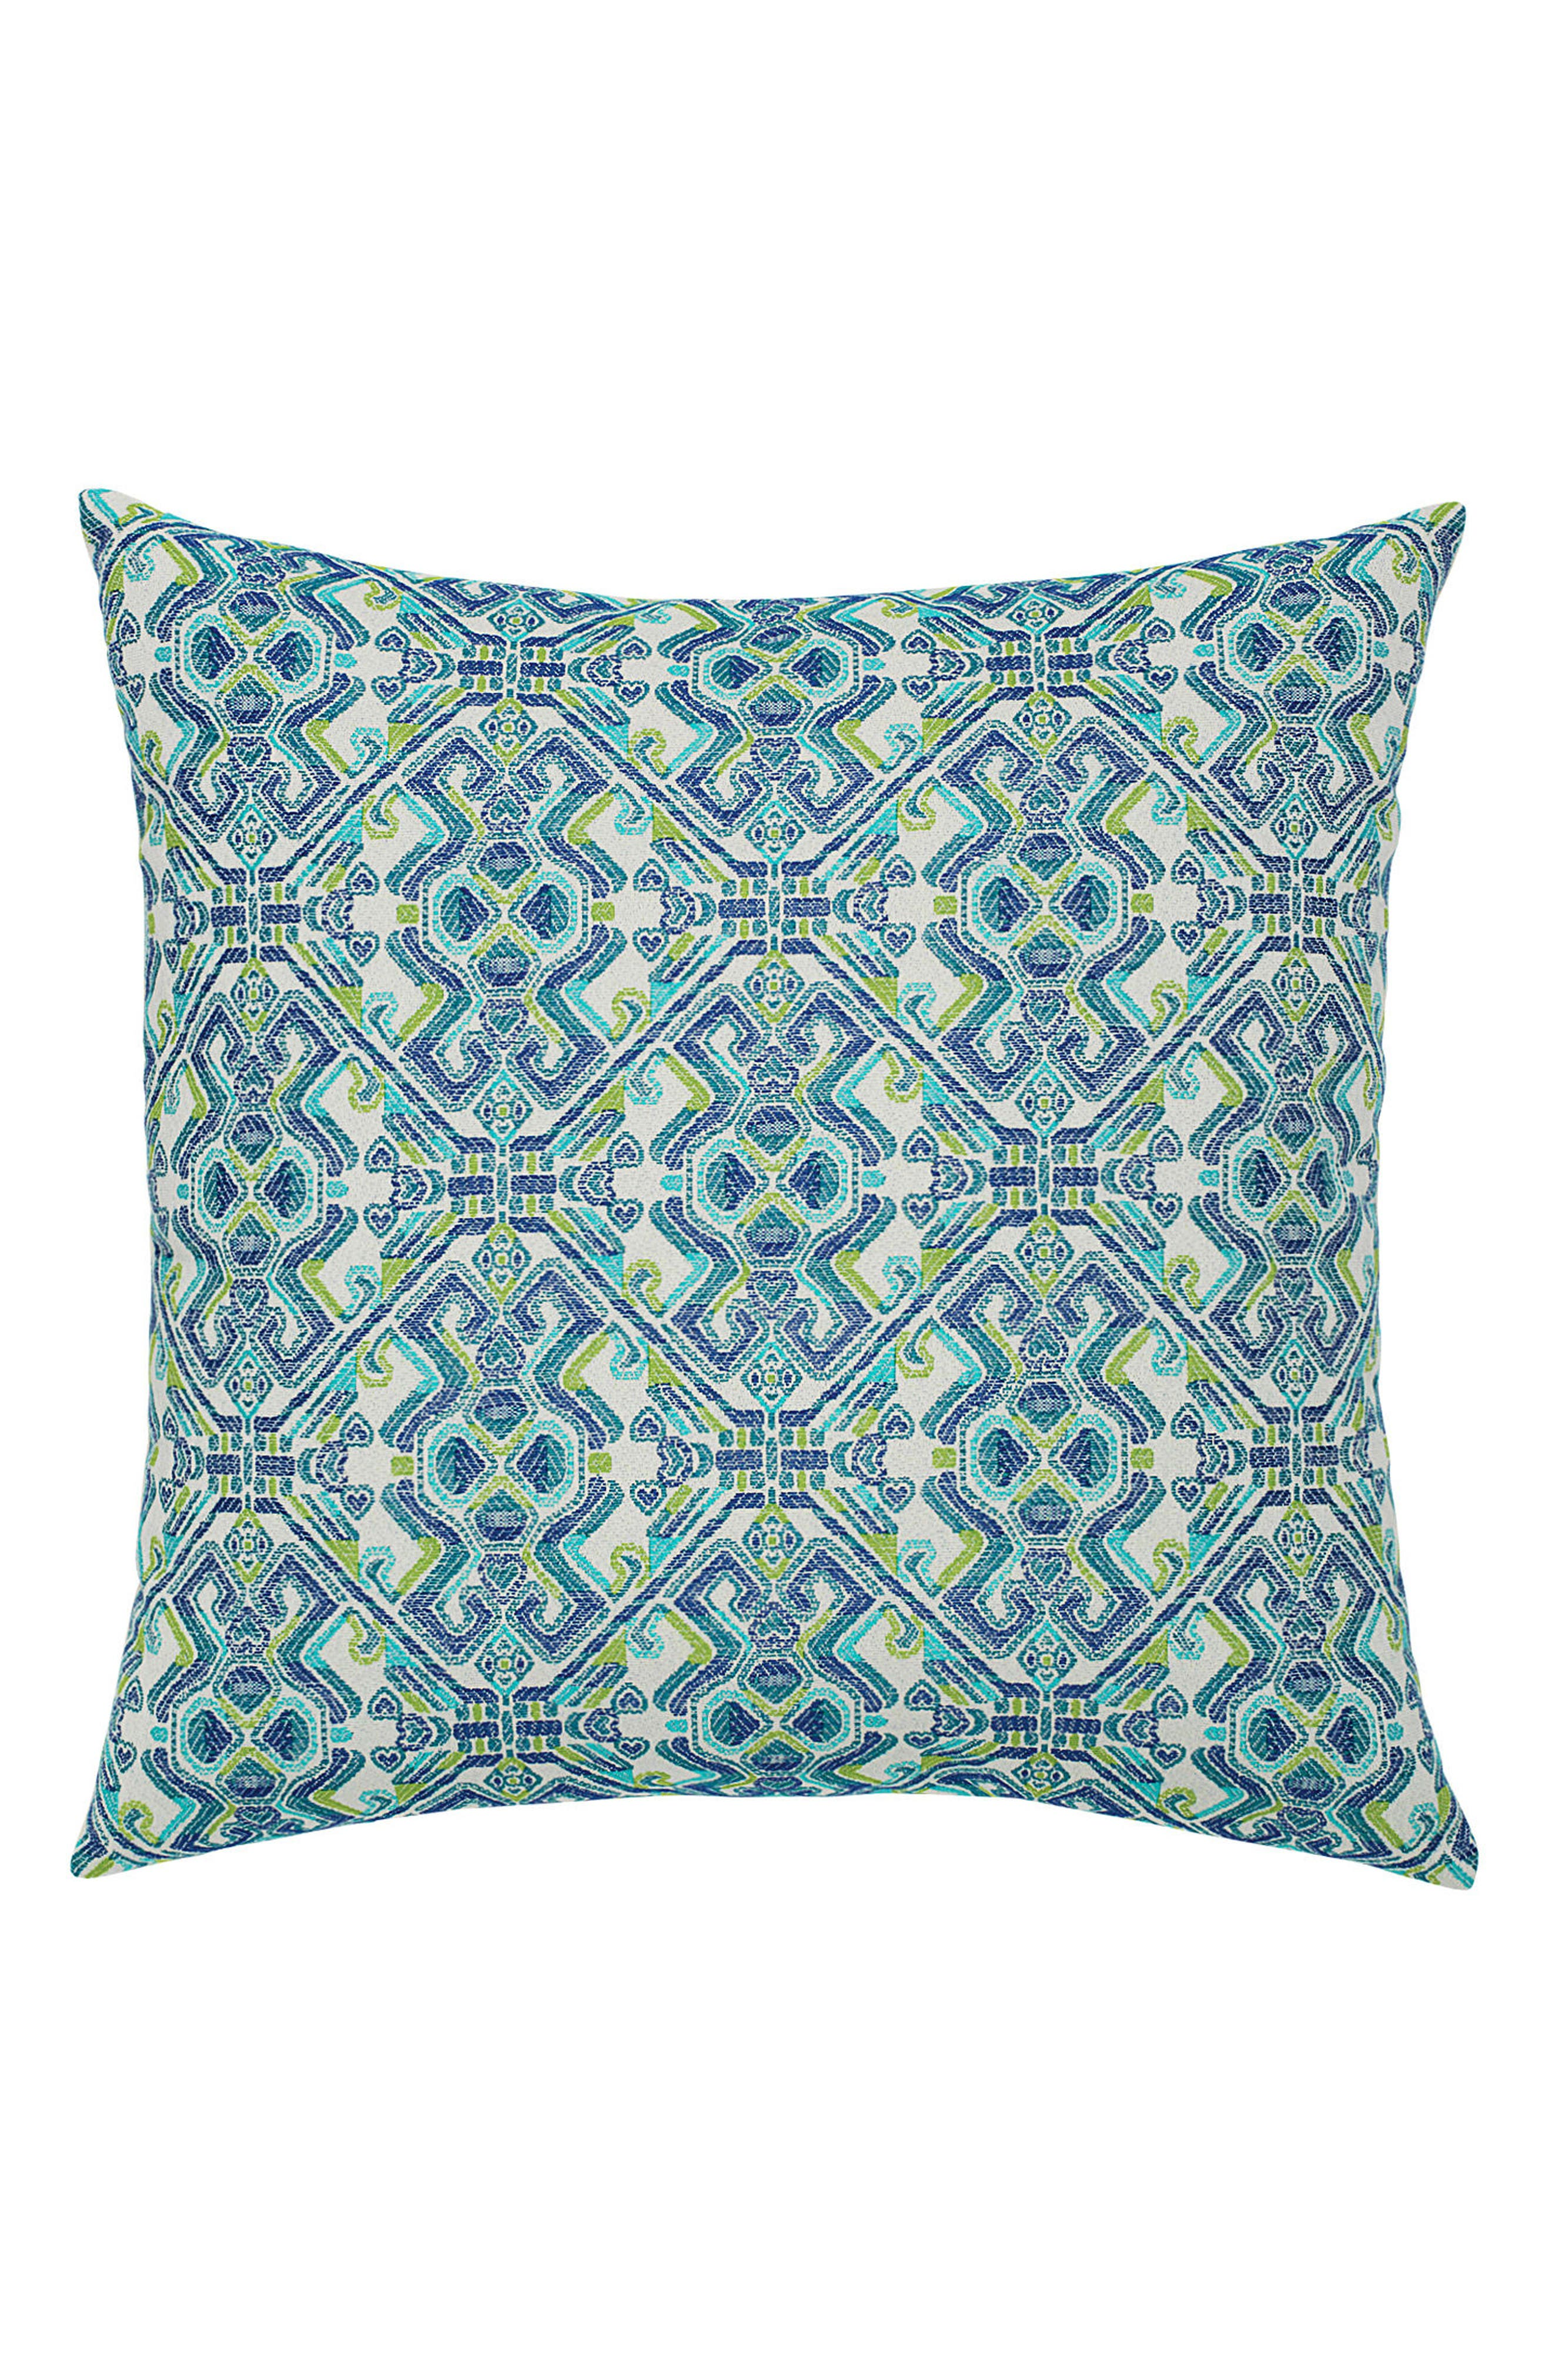 Delphi Indoor/Outdoor Accent Pillow,                         Main,                         color, BLUE MULTI